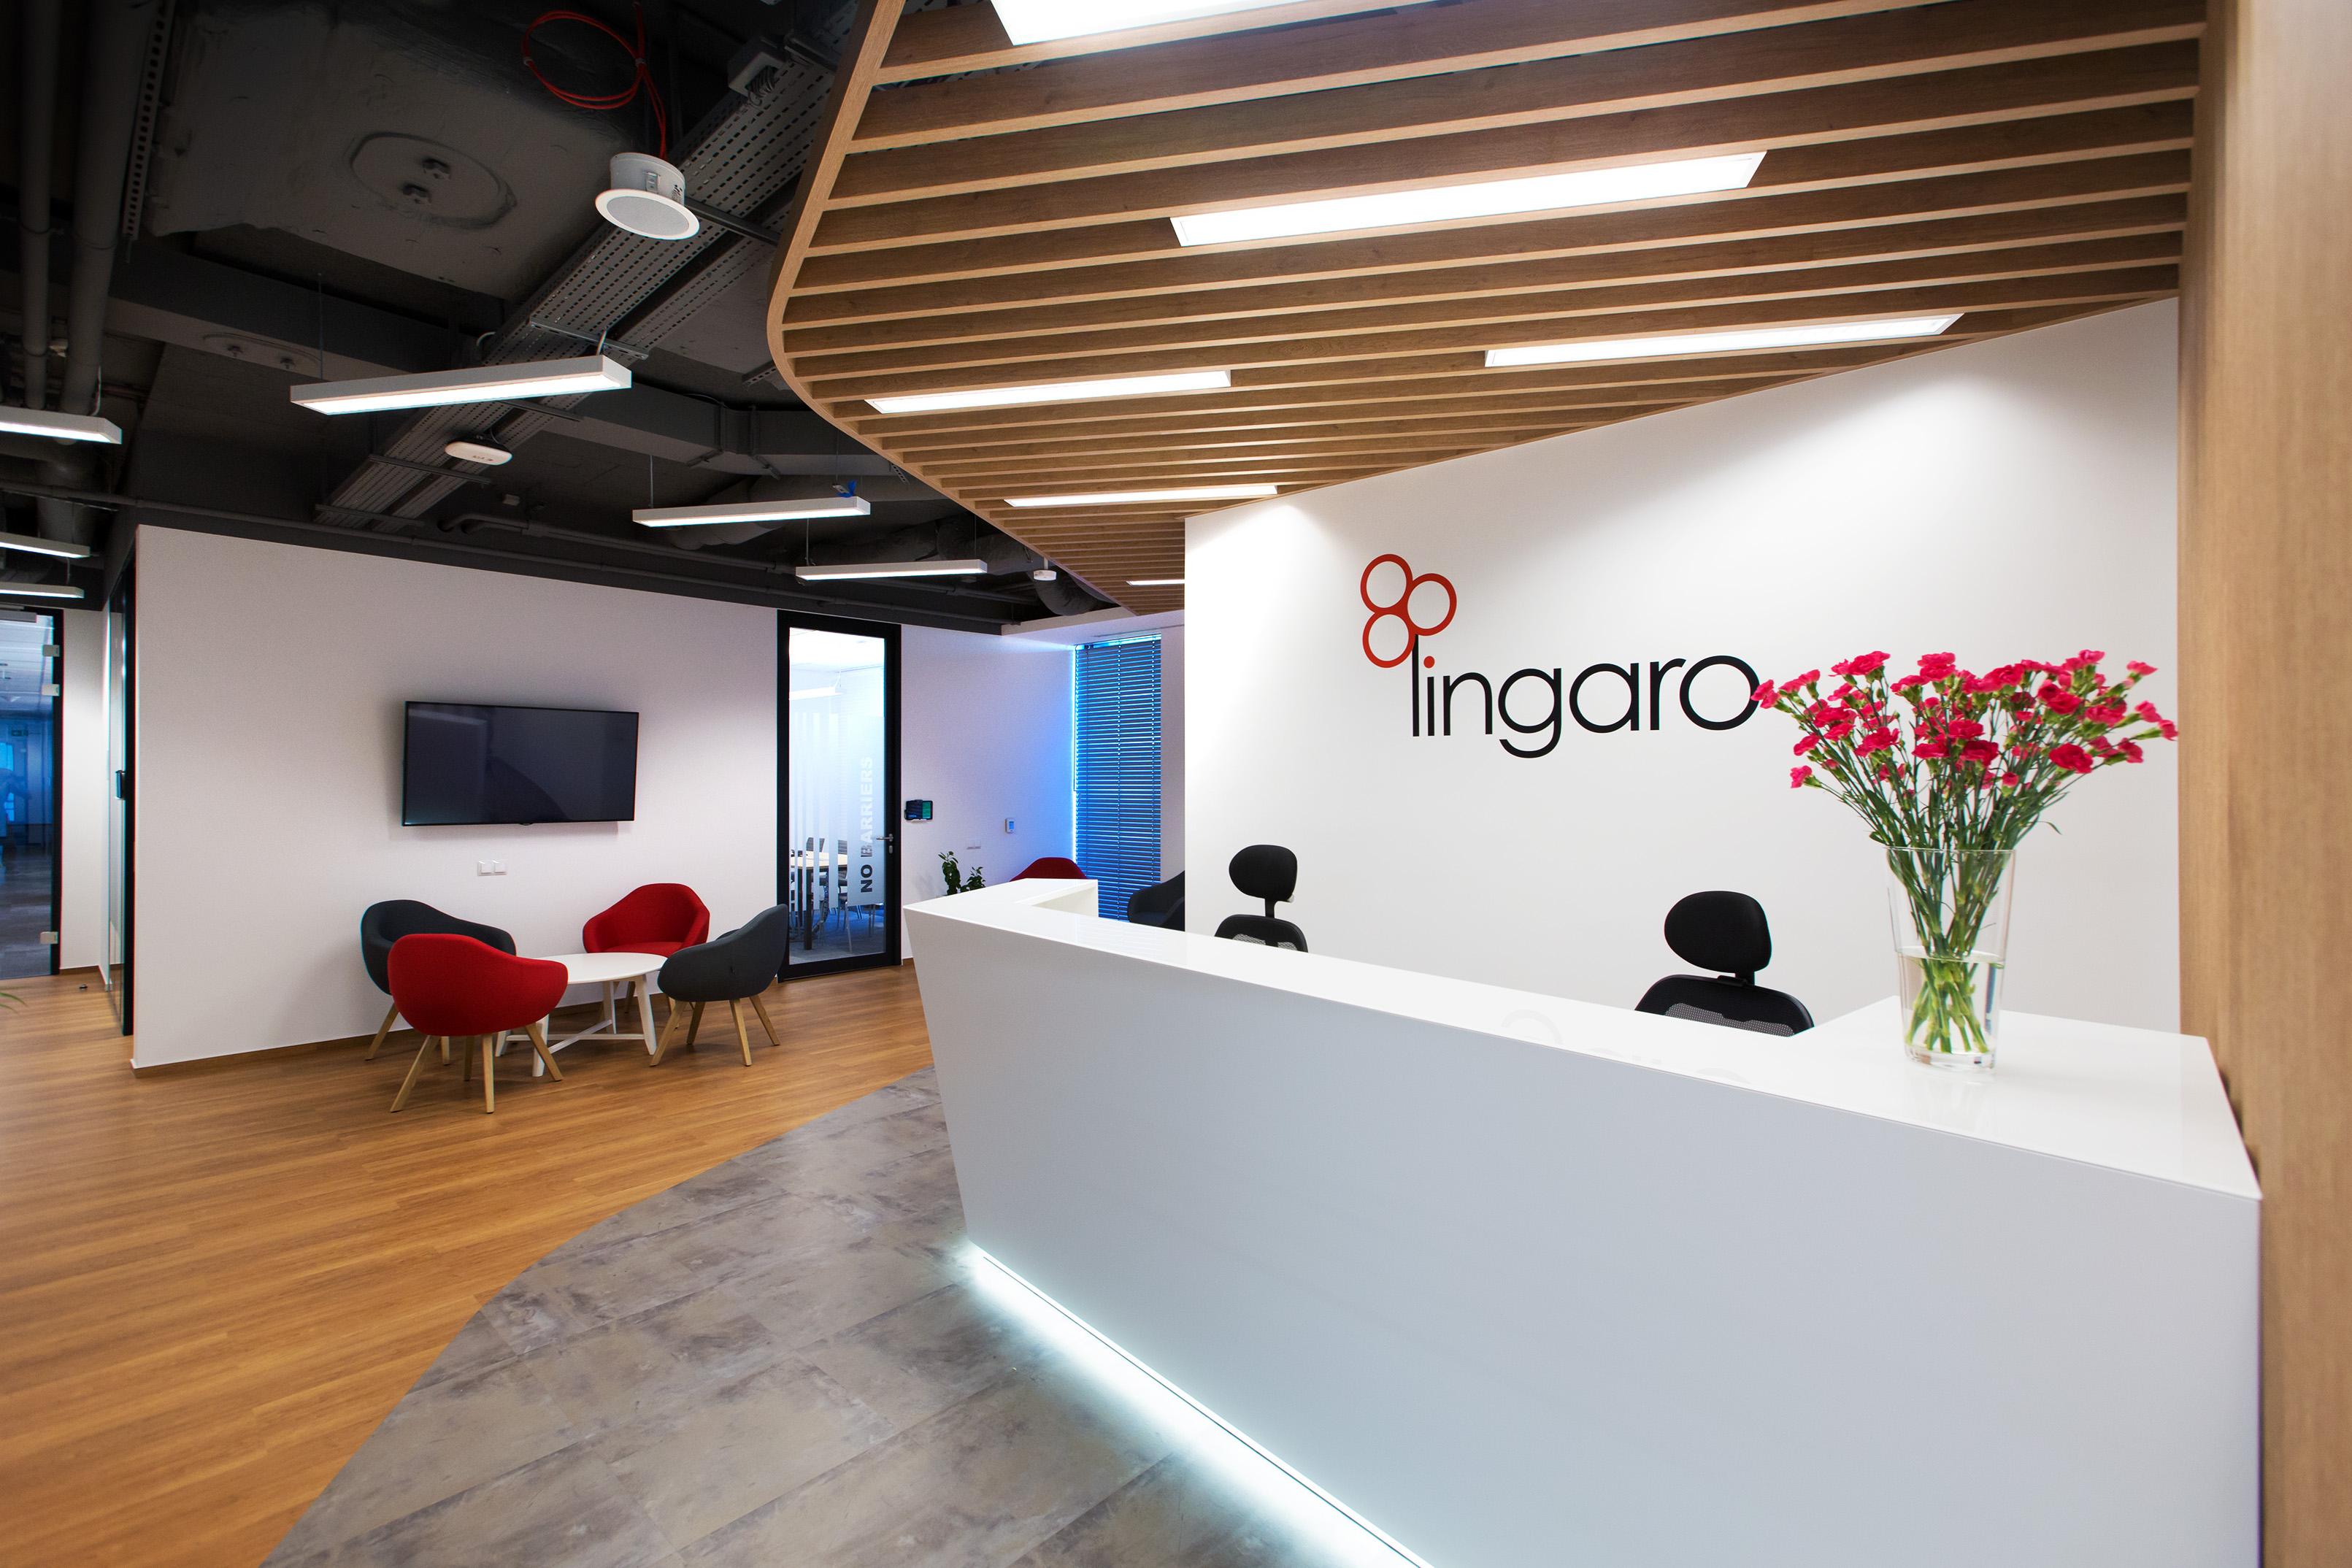 Lingaro_26